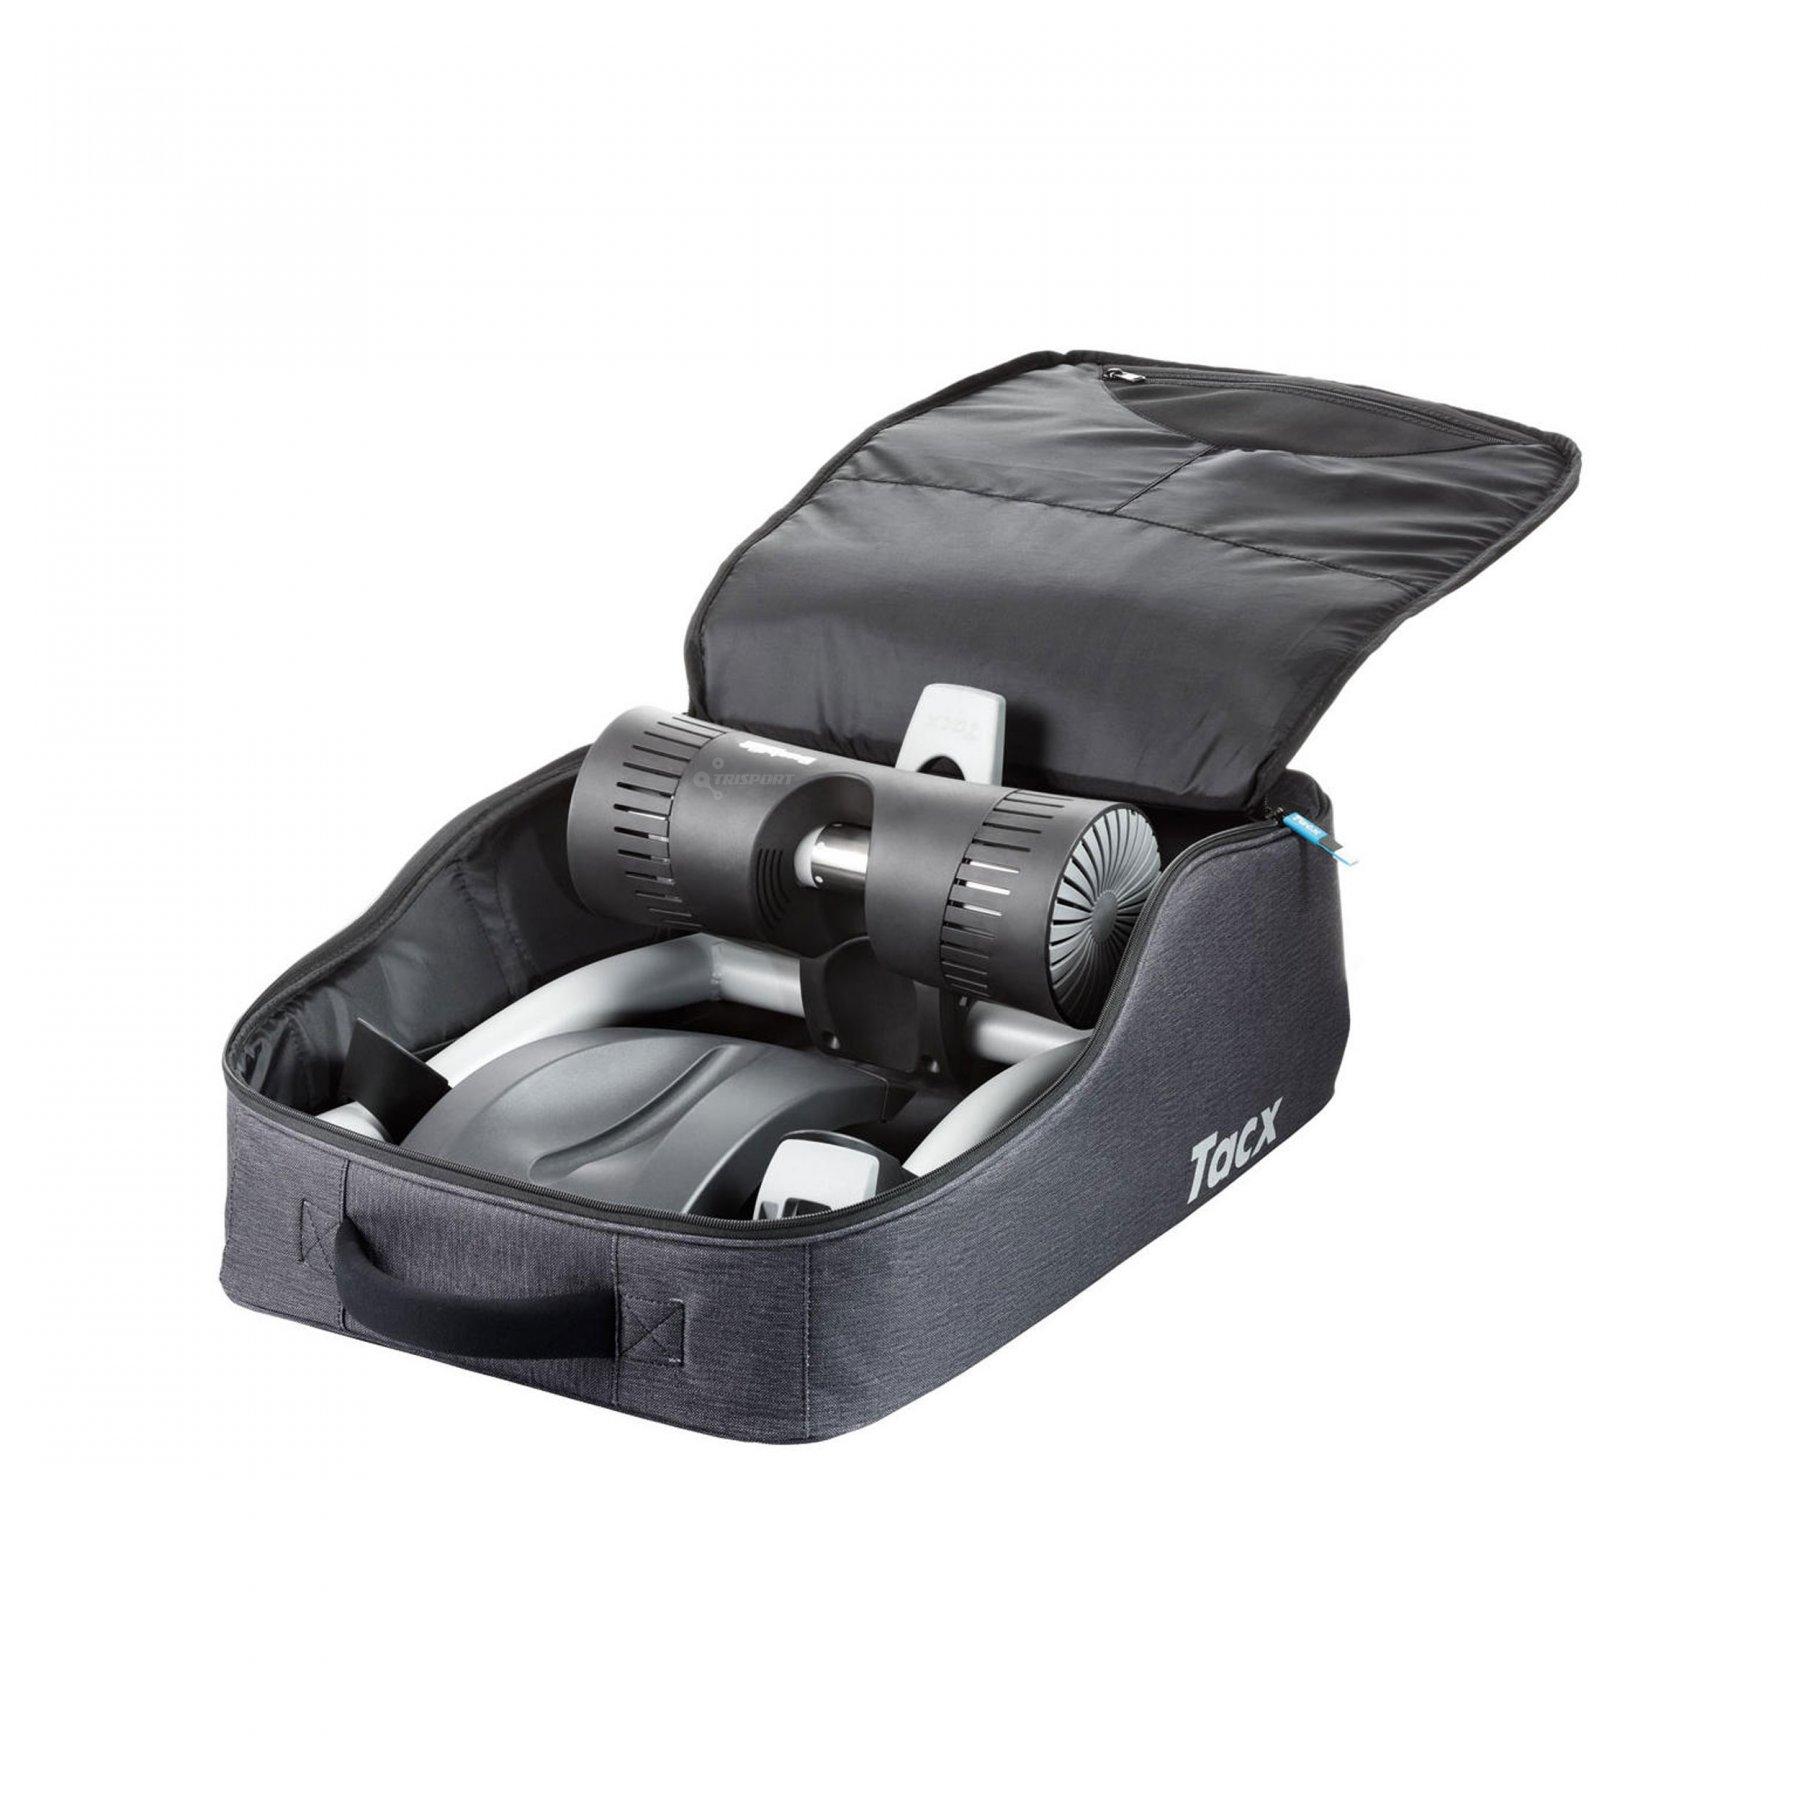 Tacx Home Trainer Bag Compatible With Bushido, Vortex